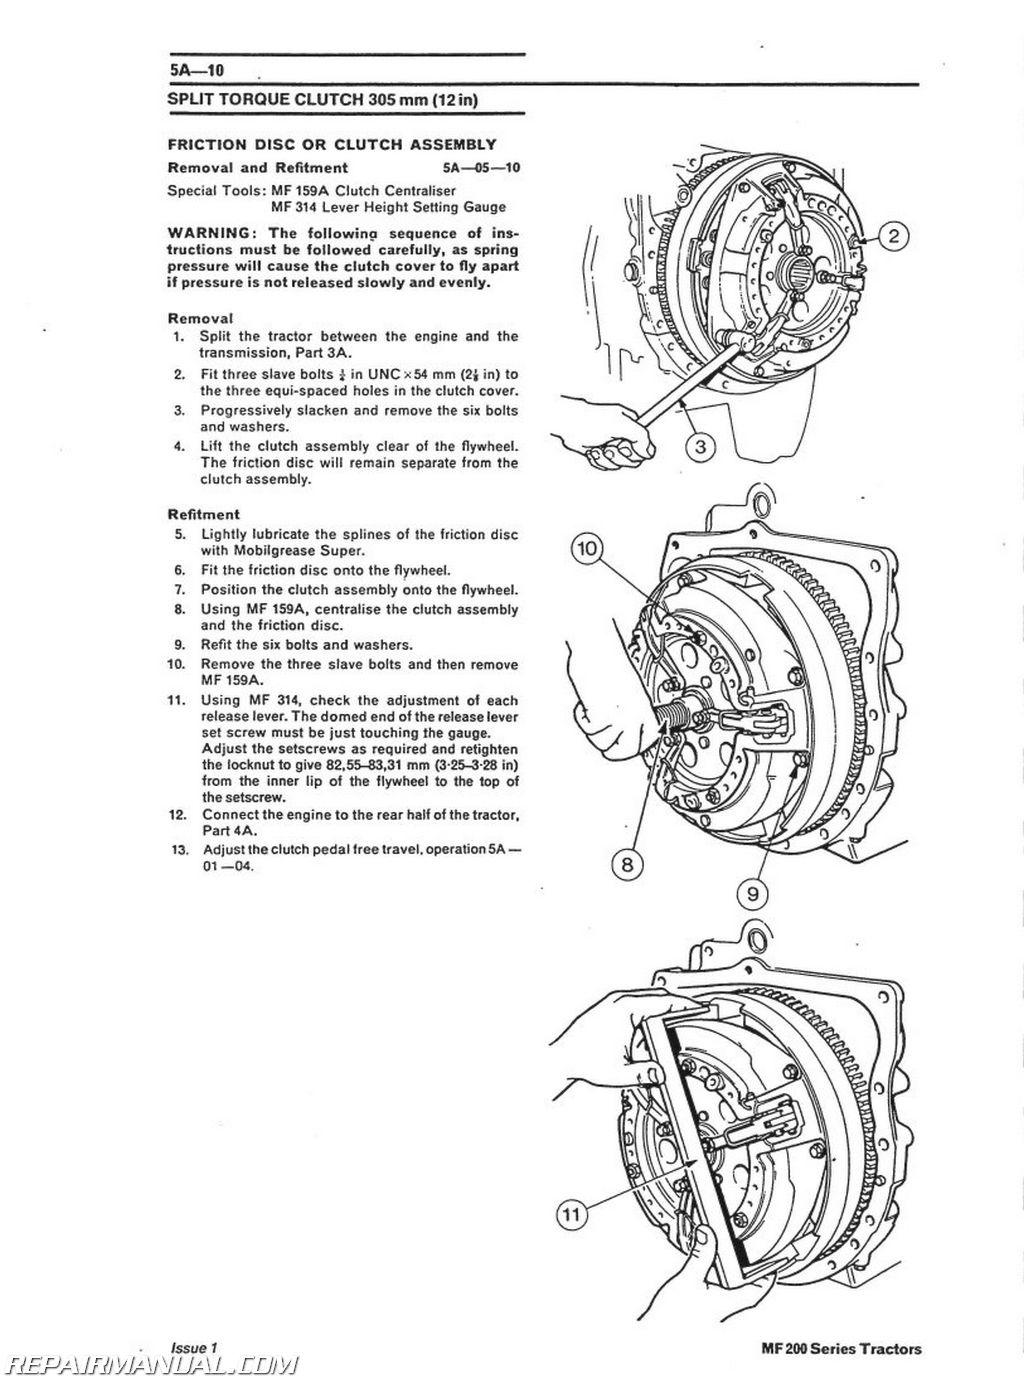 Massey Ferguson Mf230 Mf240 Mf250 Mf253 Mf270 Mf290 Mf298 Service Manual